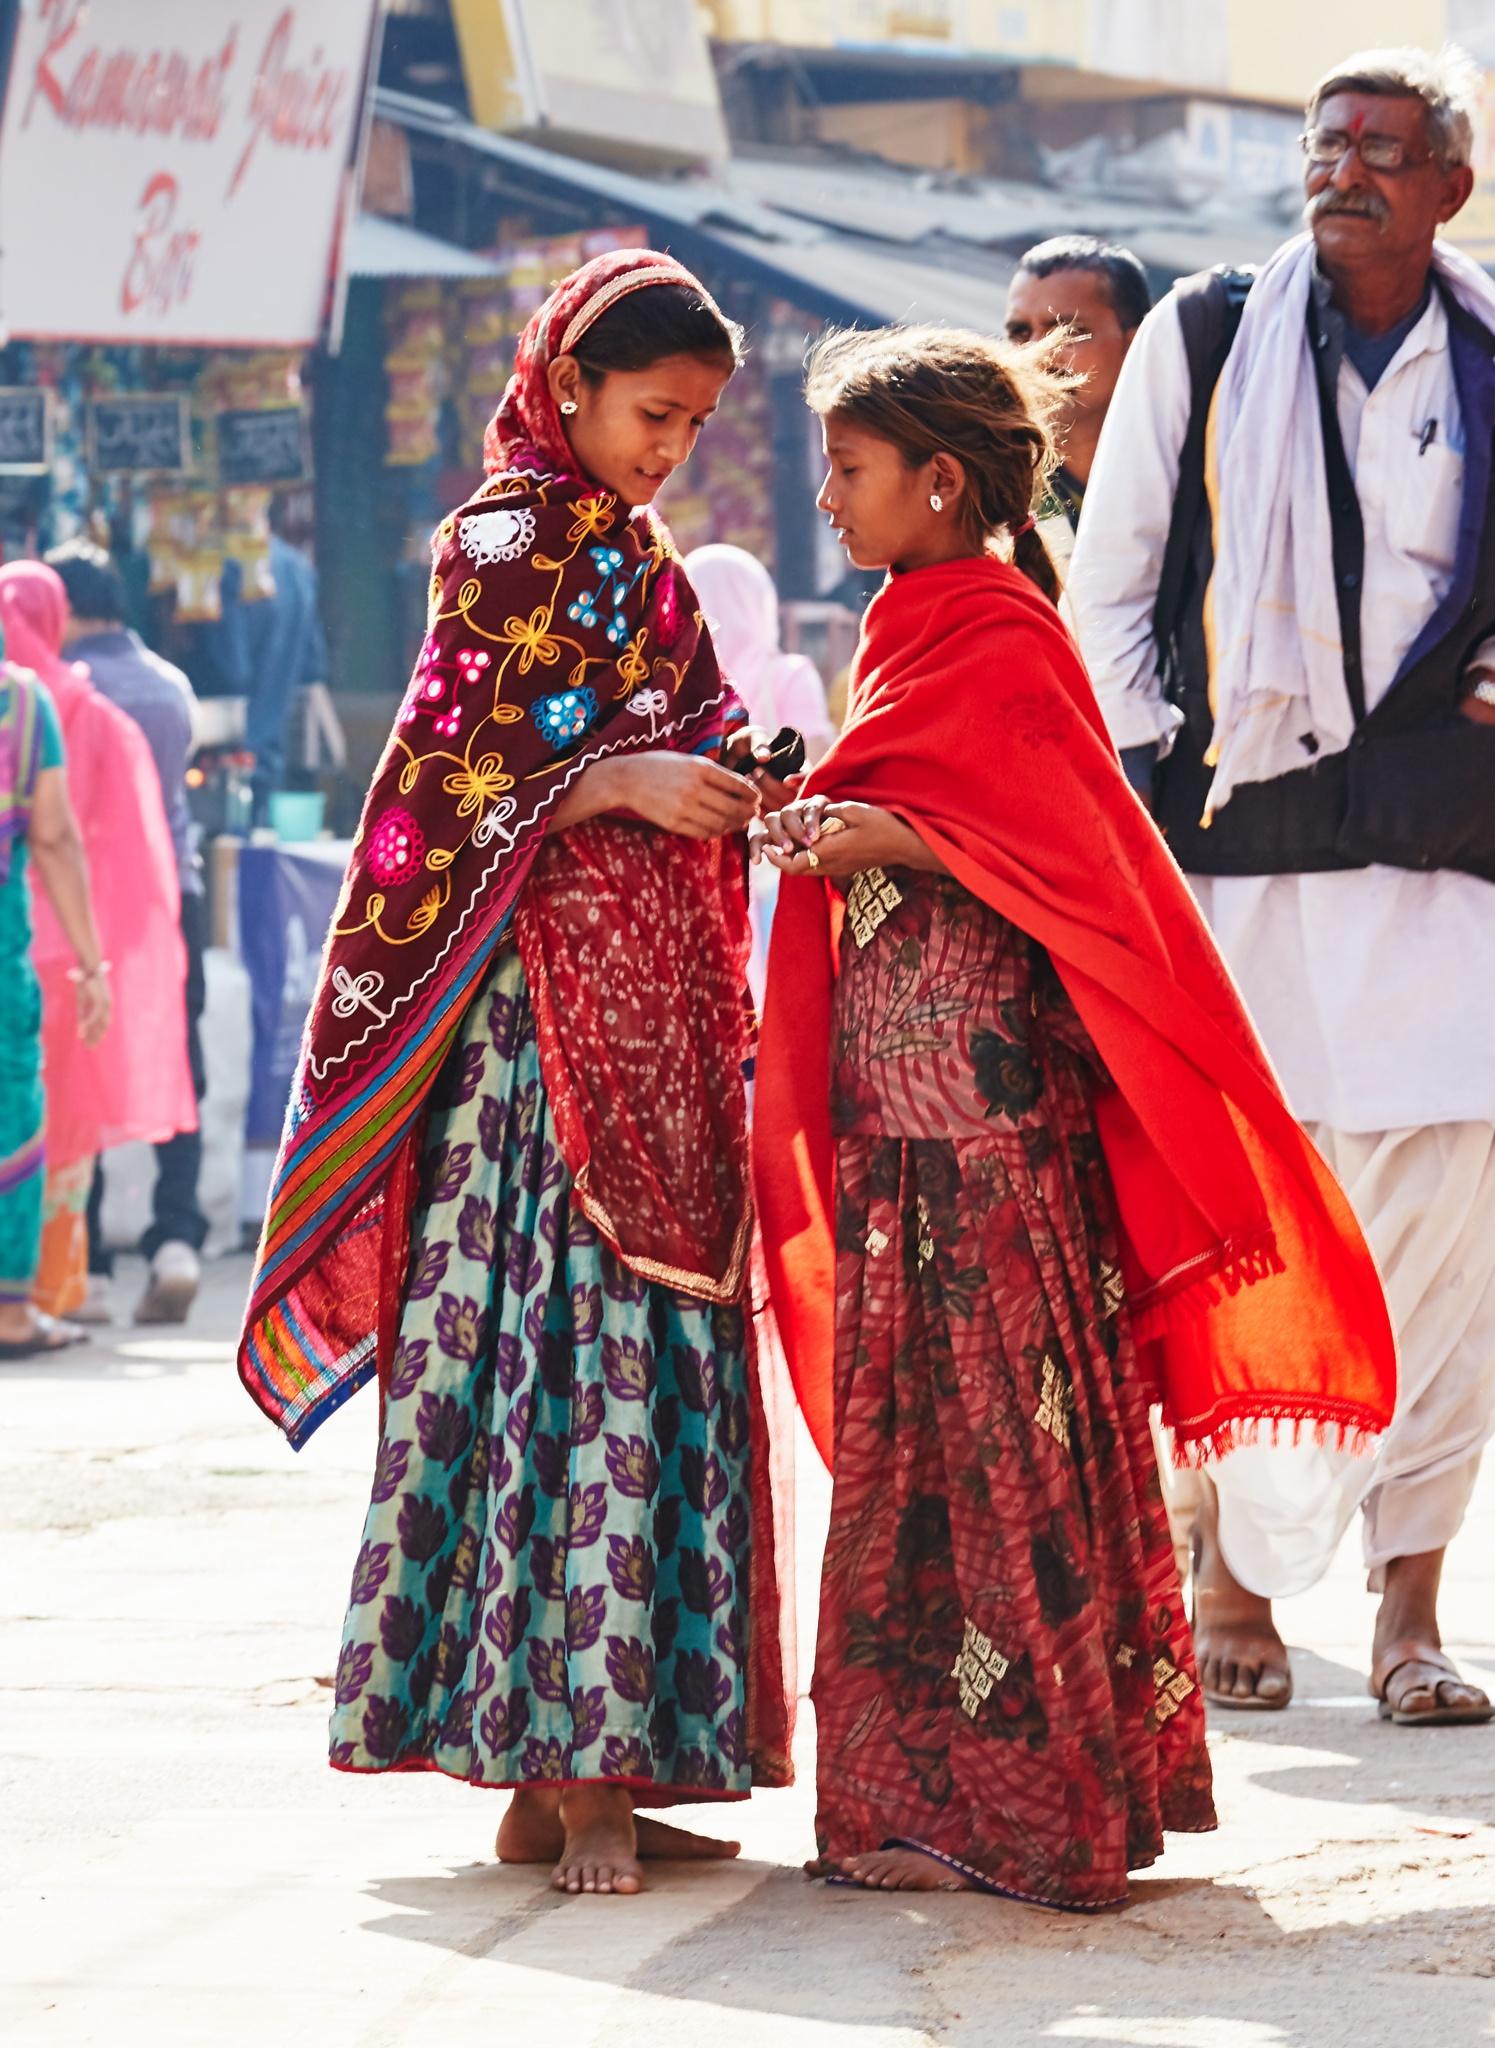 Pushkar, India street shot 012 by PatrickLeeKKAh9